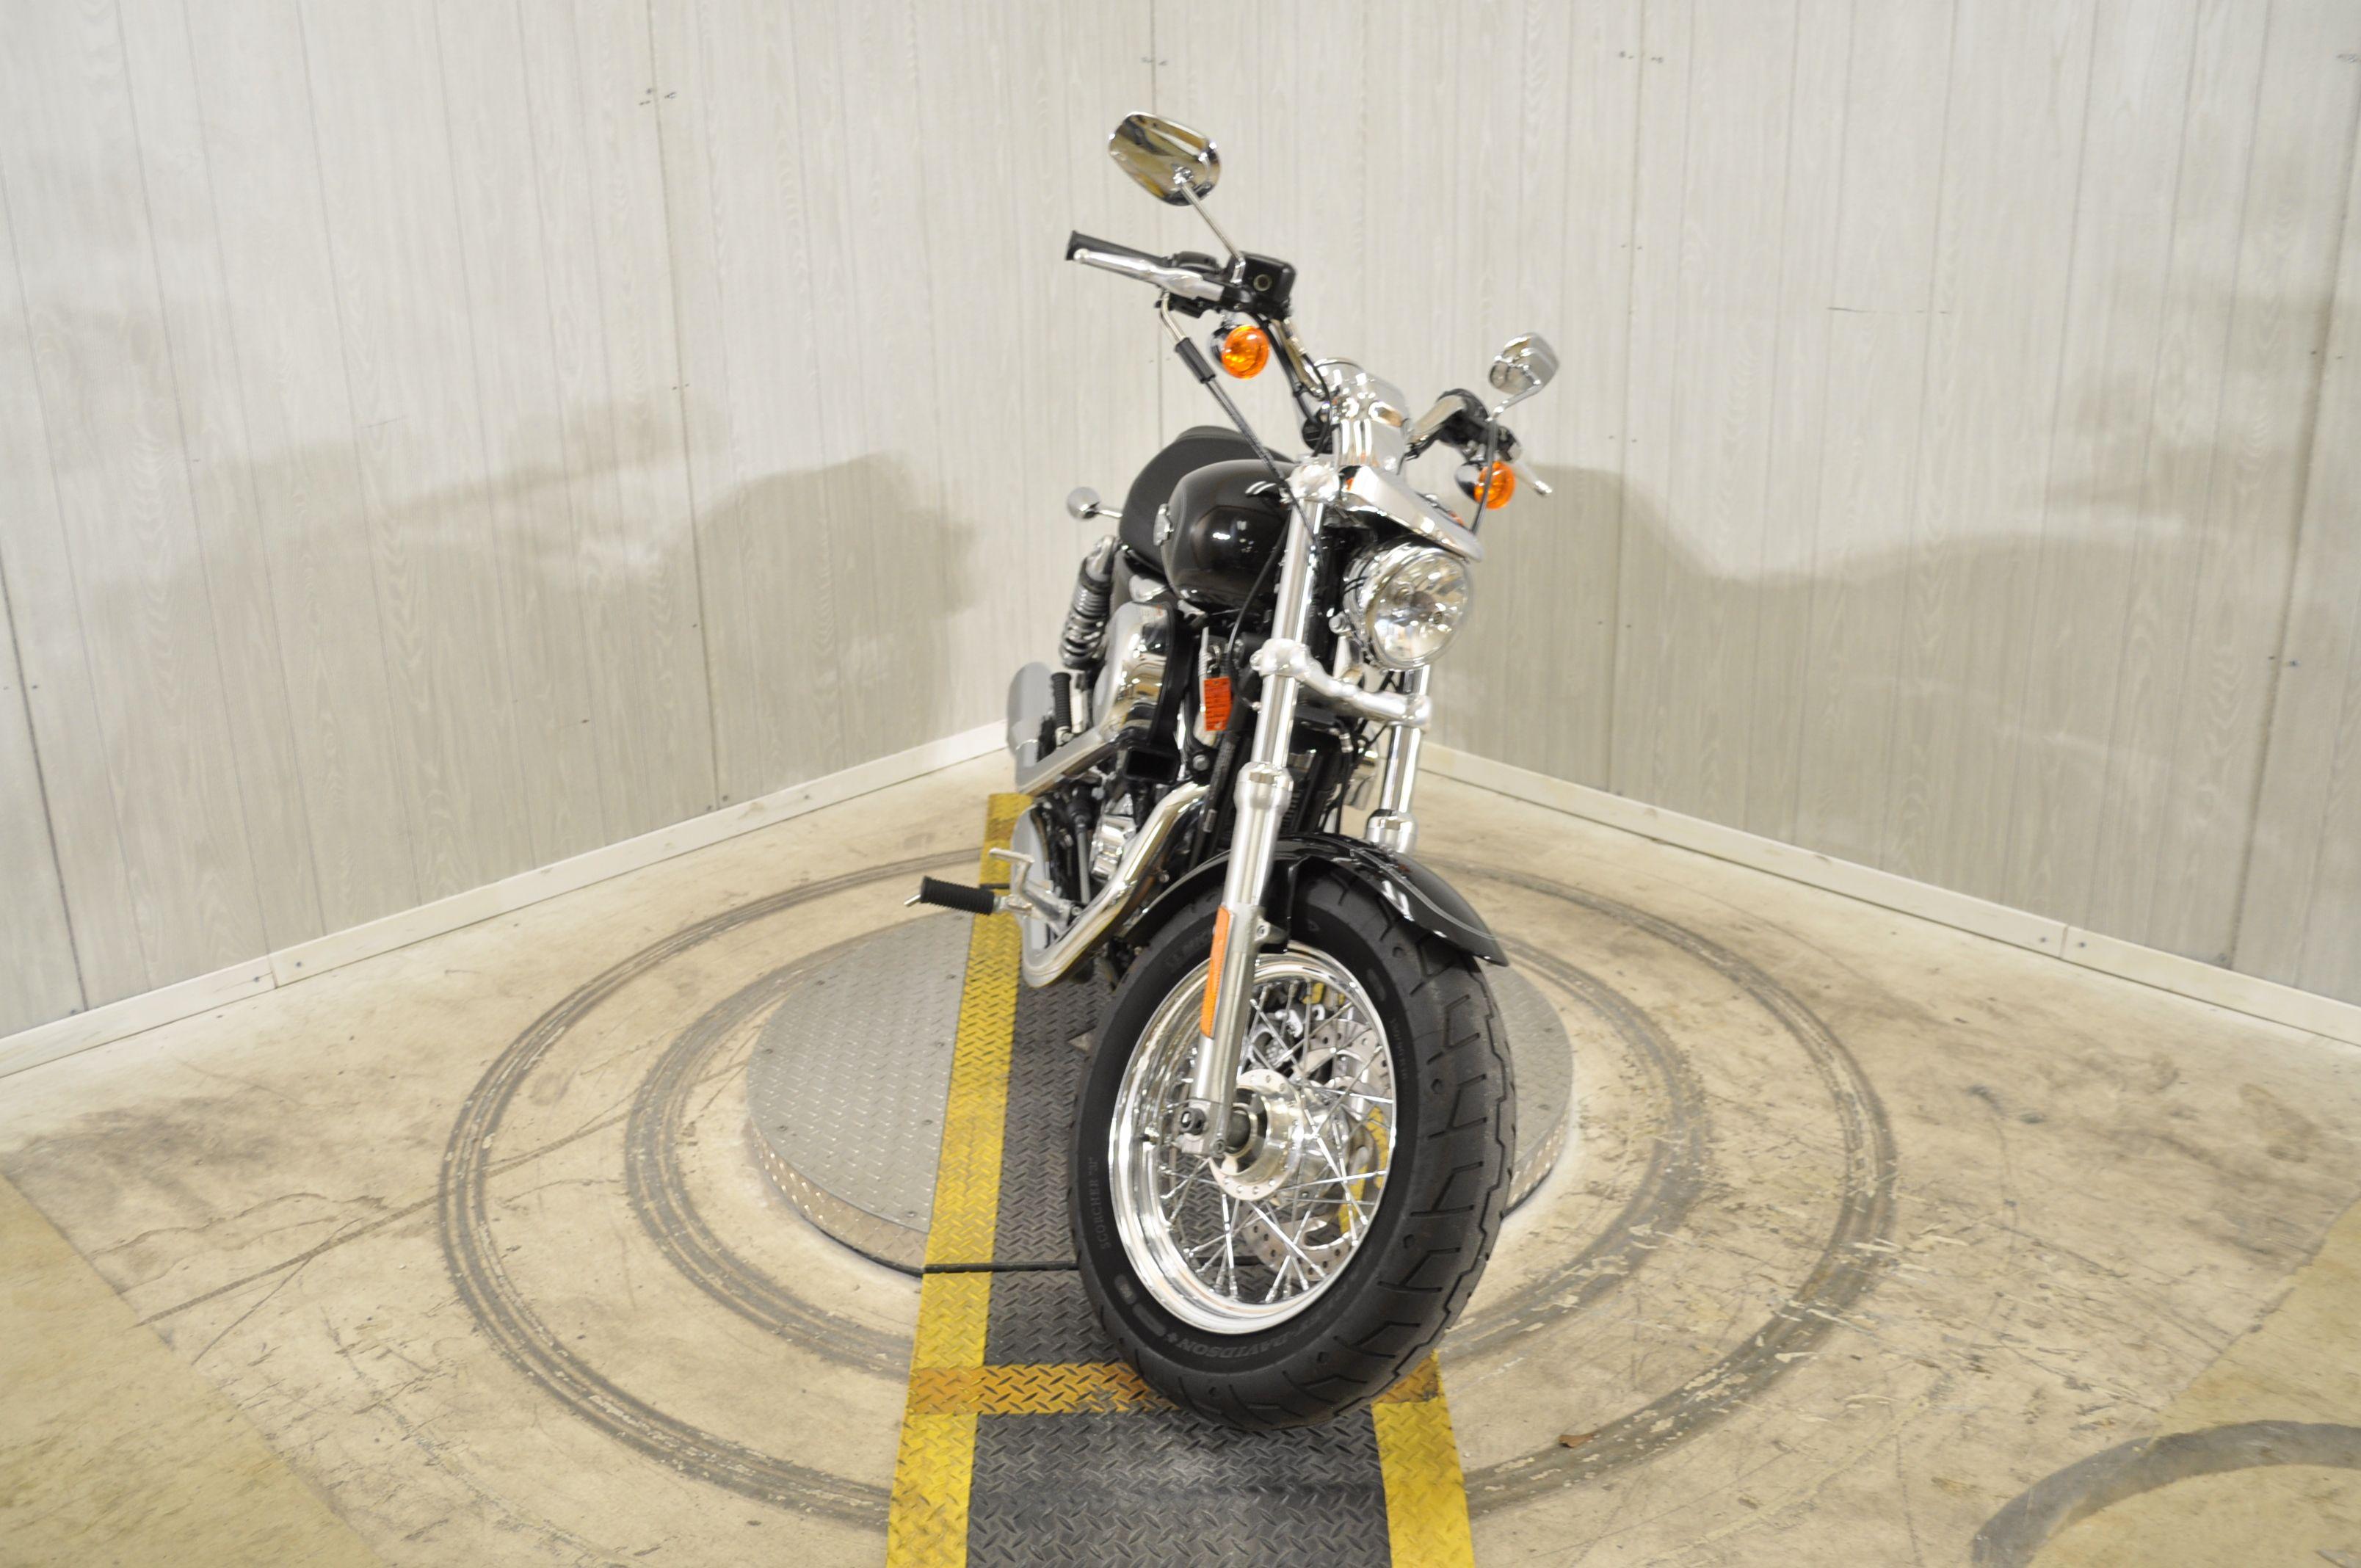 Pre-Owned 2017 Harley-Davidson 1200 Custom XL1200C